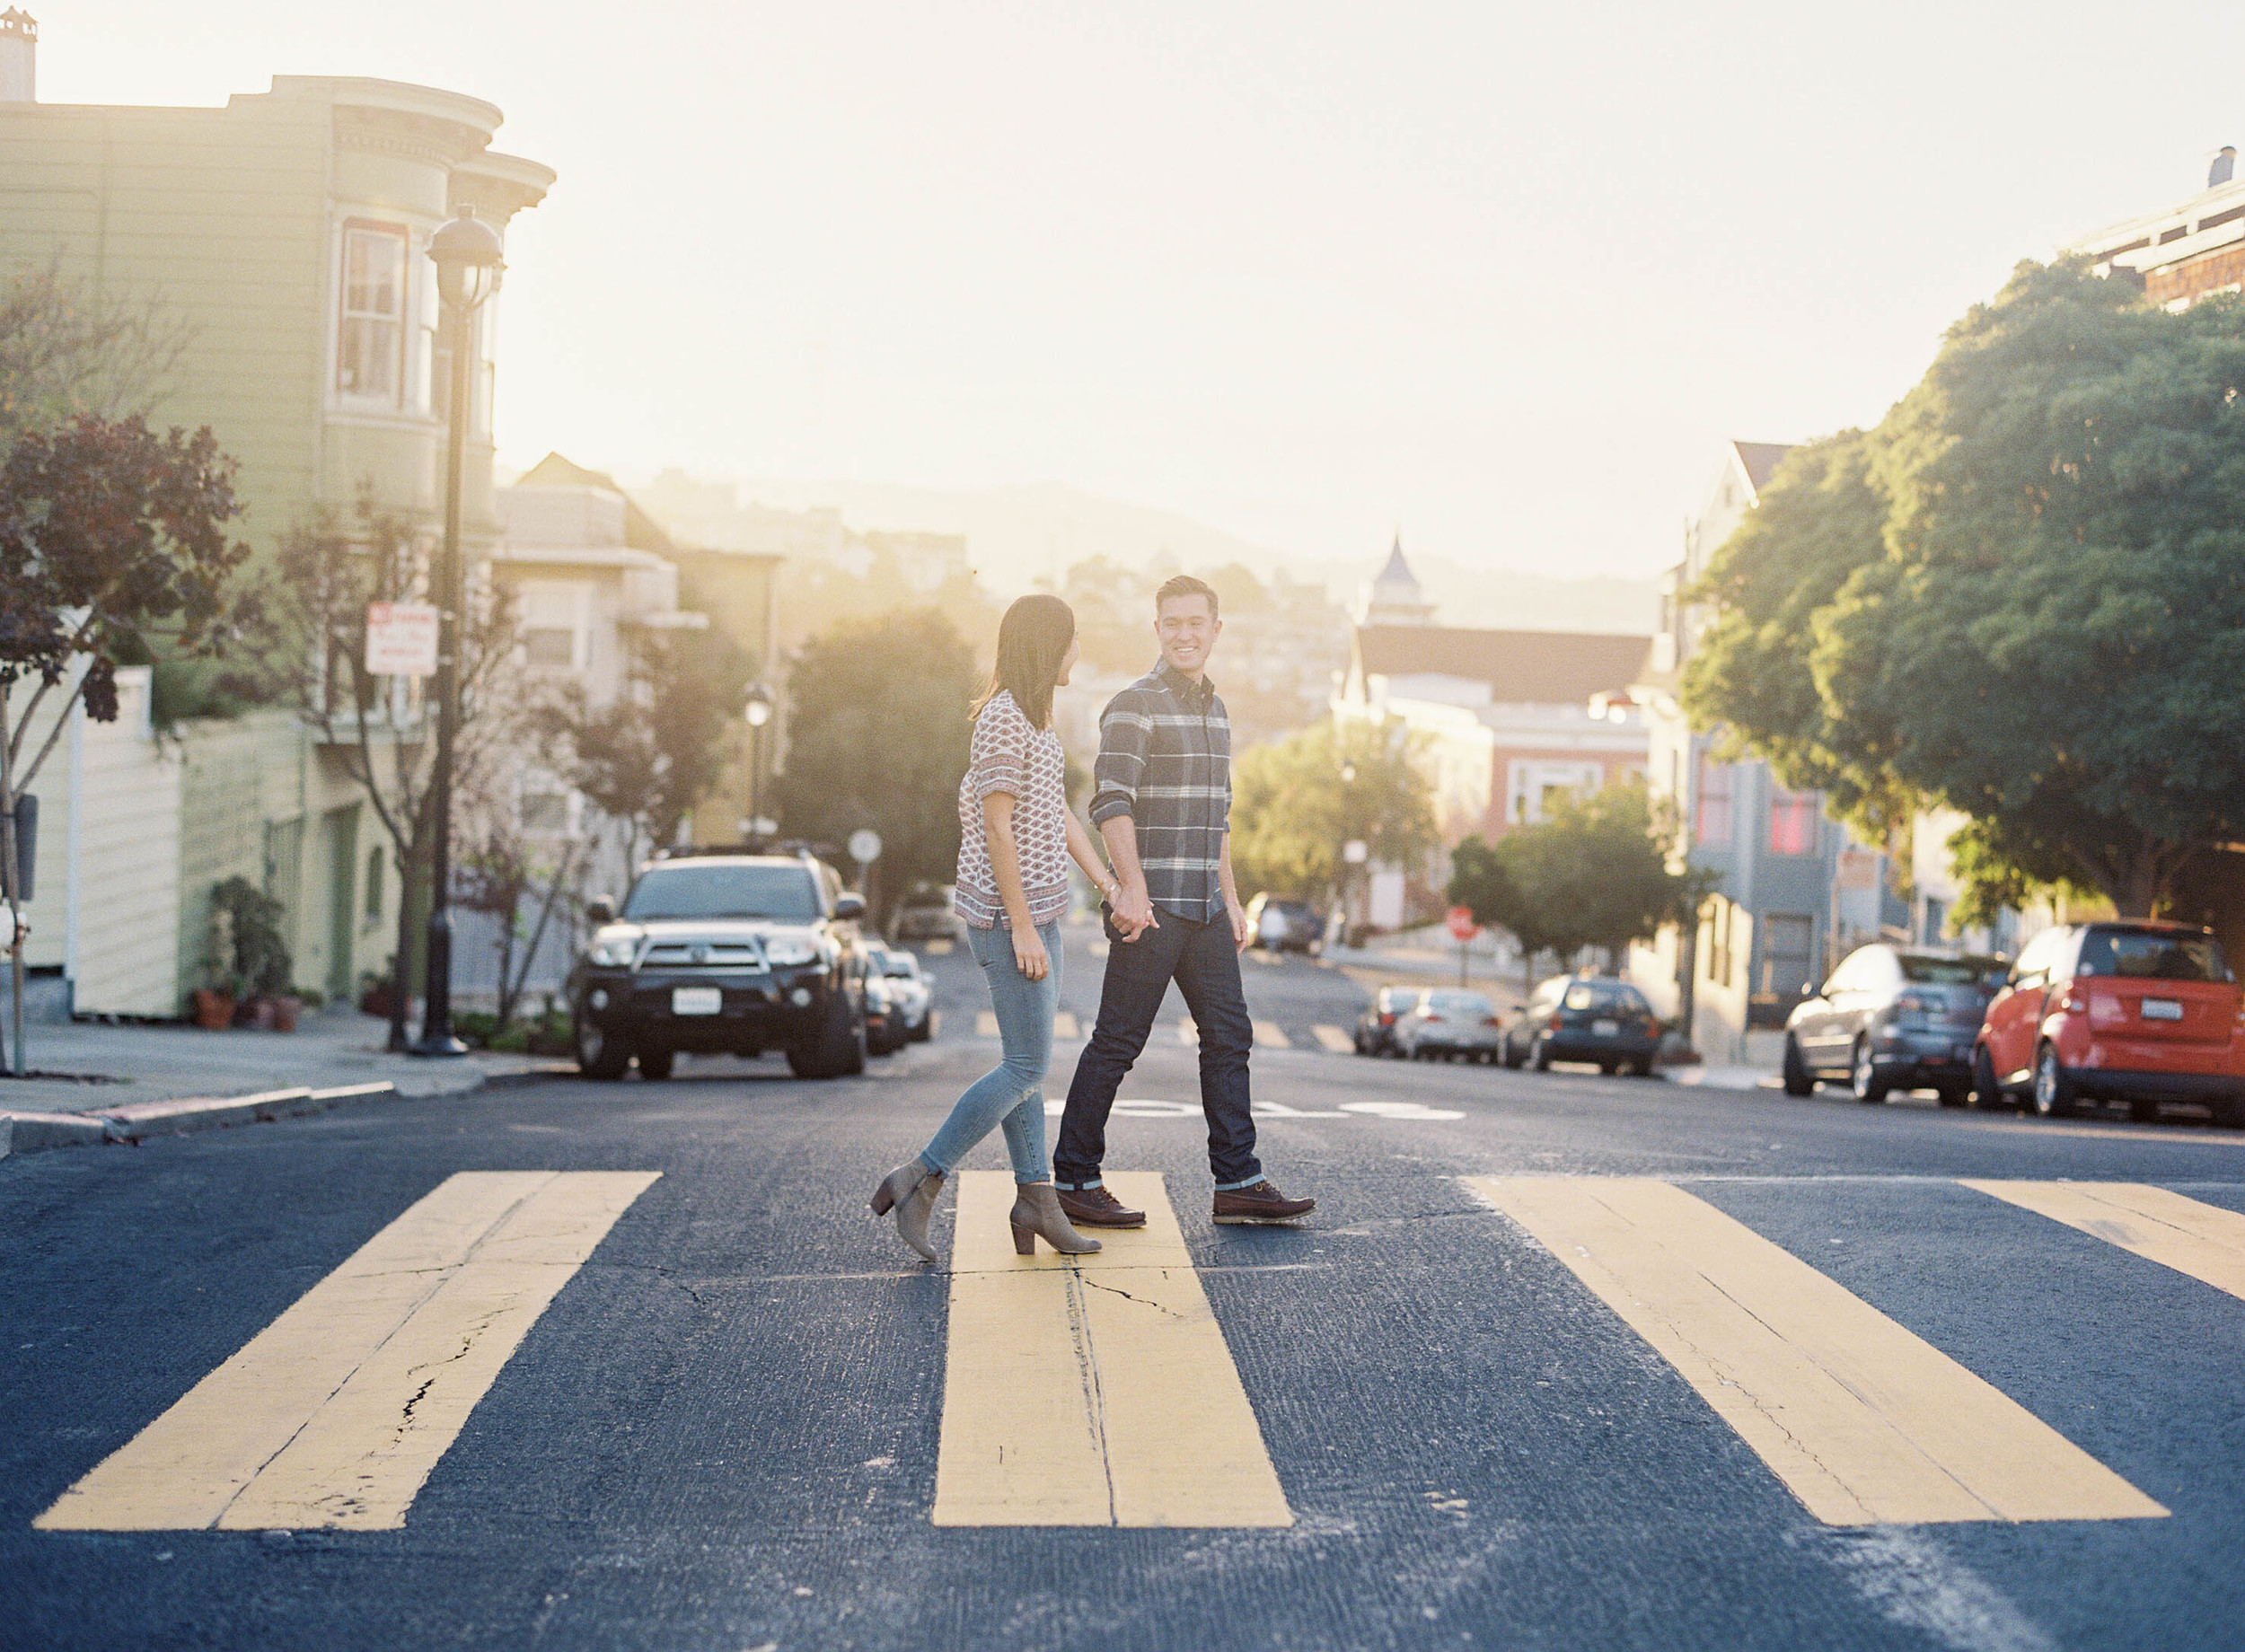 Meghan Mehan Photography - Fine Art Film Photography - California | San Francisco | Napa | Sonoma | Carmel | Big Sur | Santa Barbara | Nashville 002.jpg